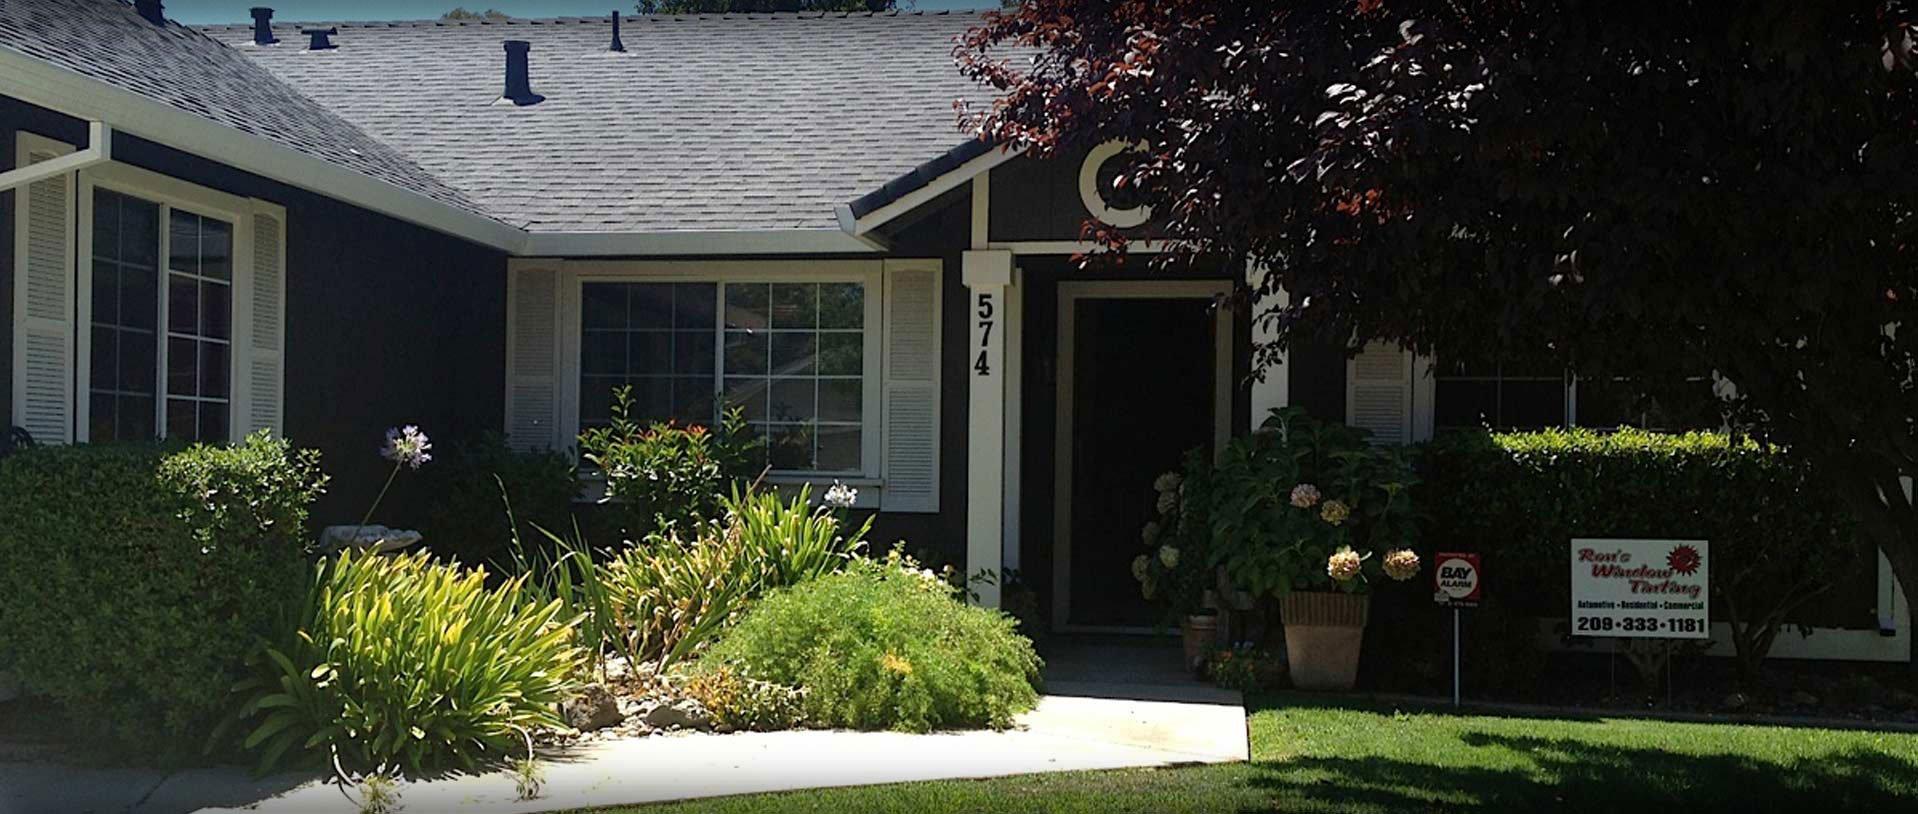 Window Tinting Sacramento >> Ron's Window Tinting | Protective Window Films in Lodi, CA